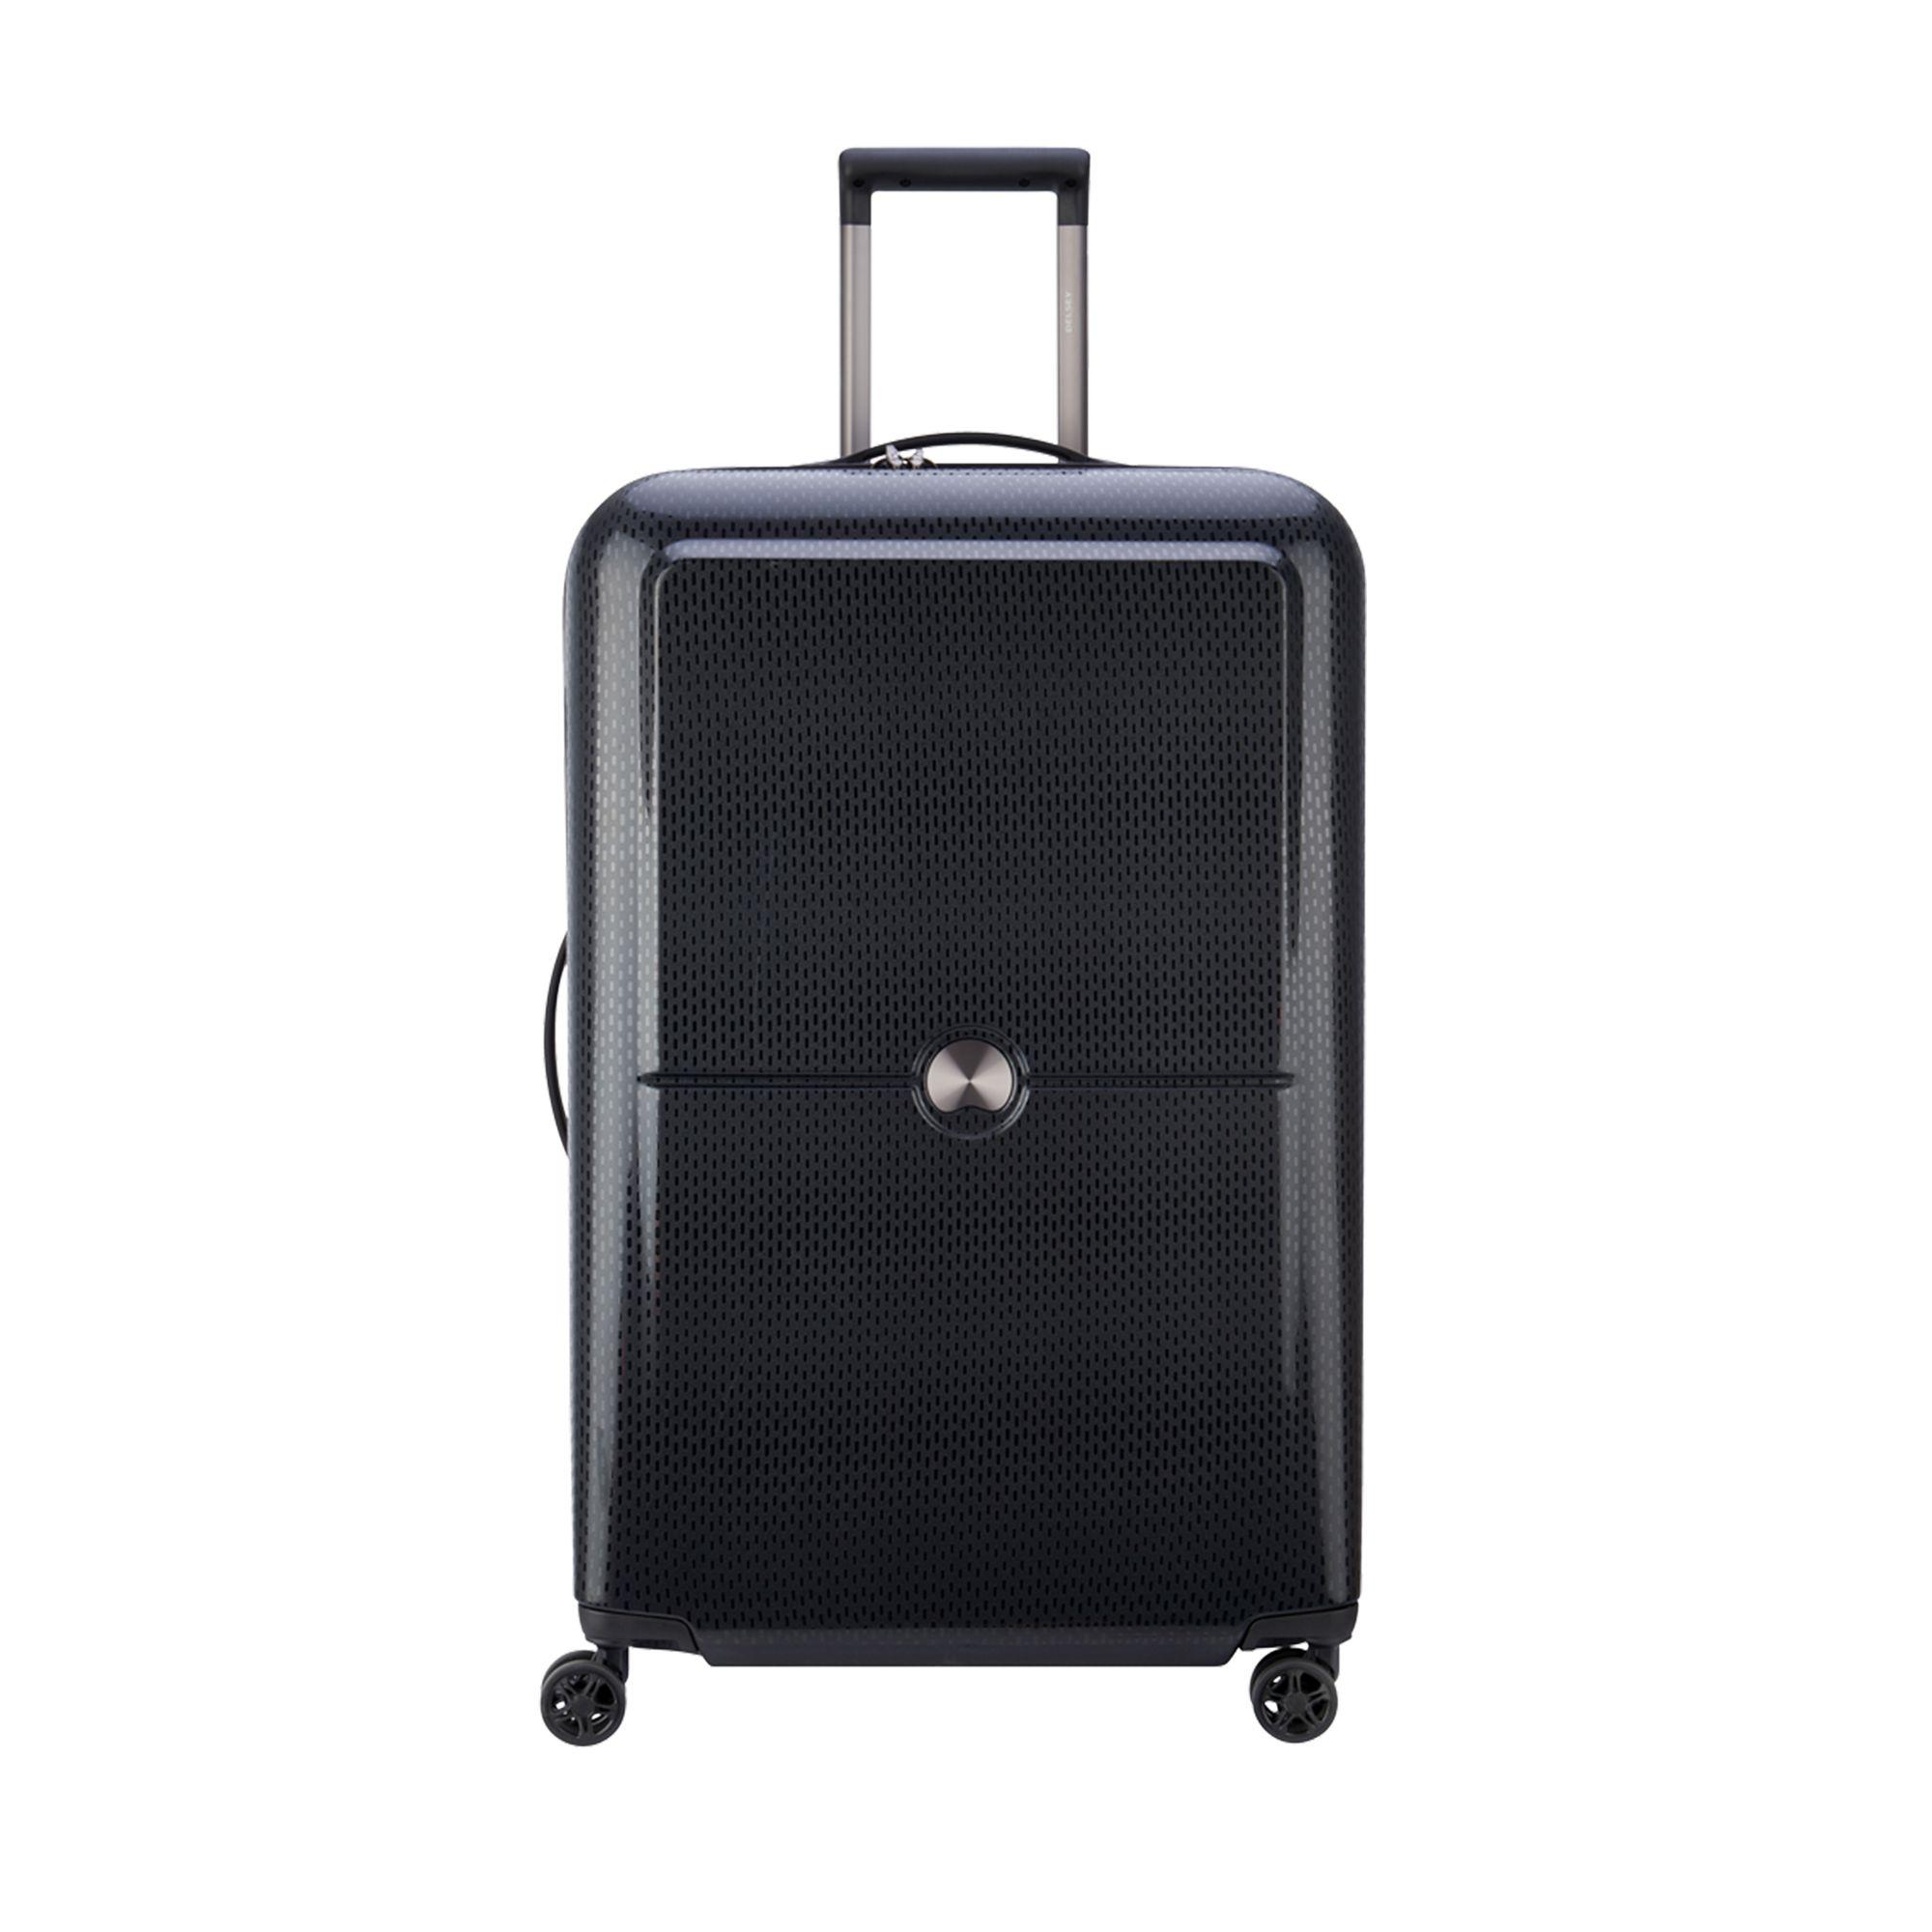 Delsey Turenne hård resväska, 4 hjul, 75 cm, Svart